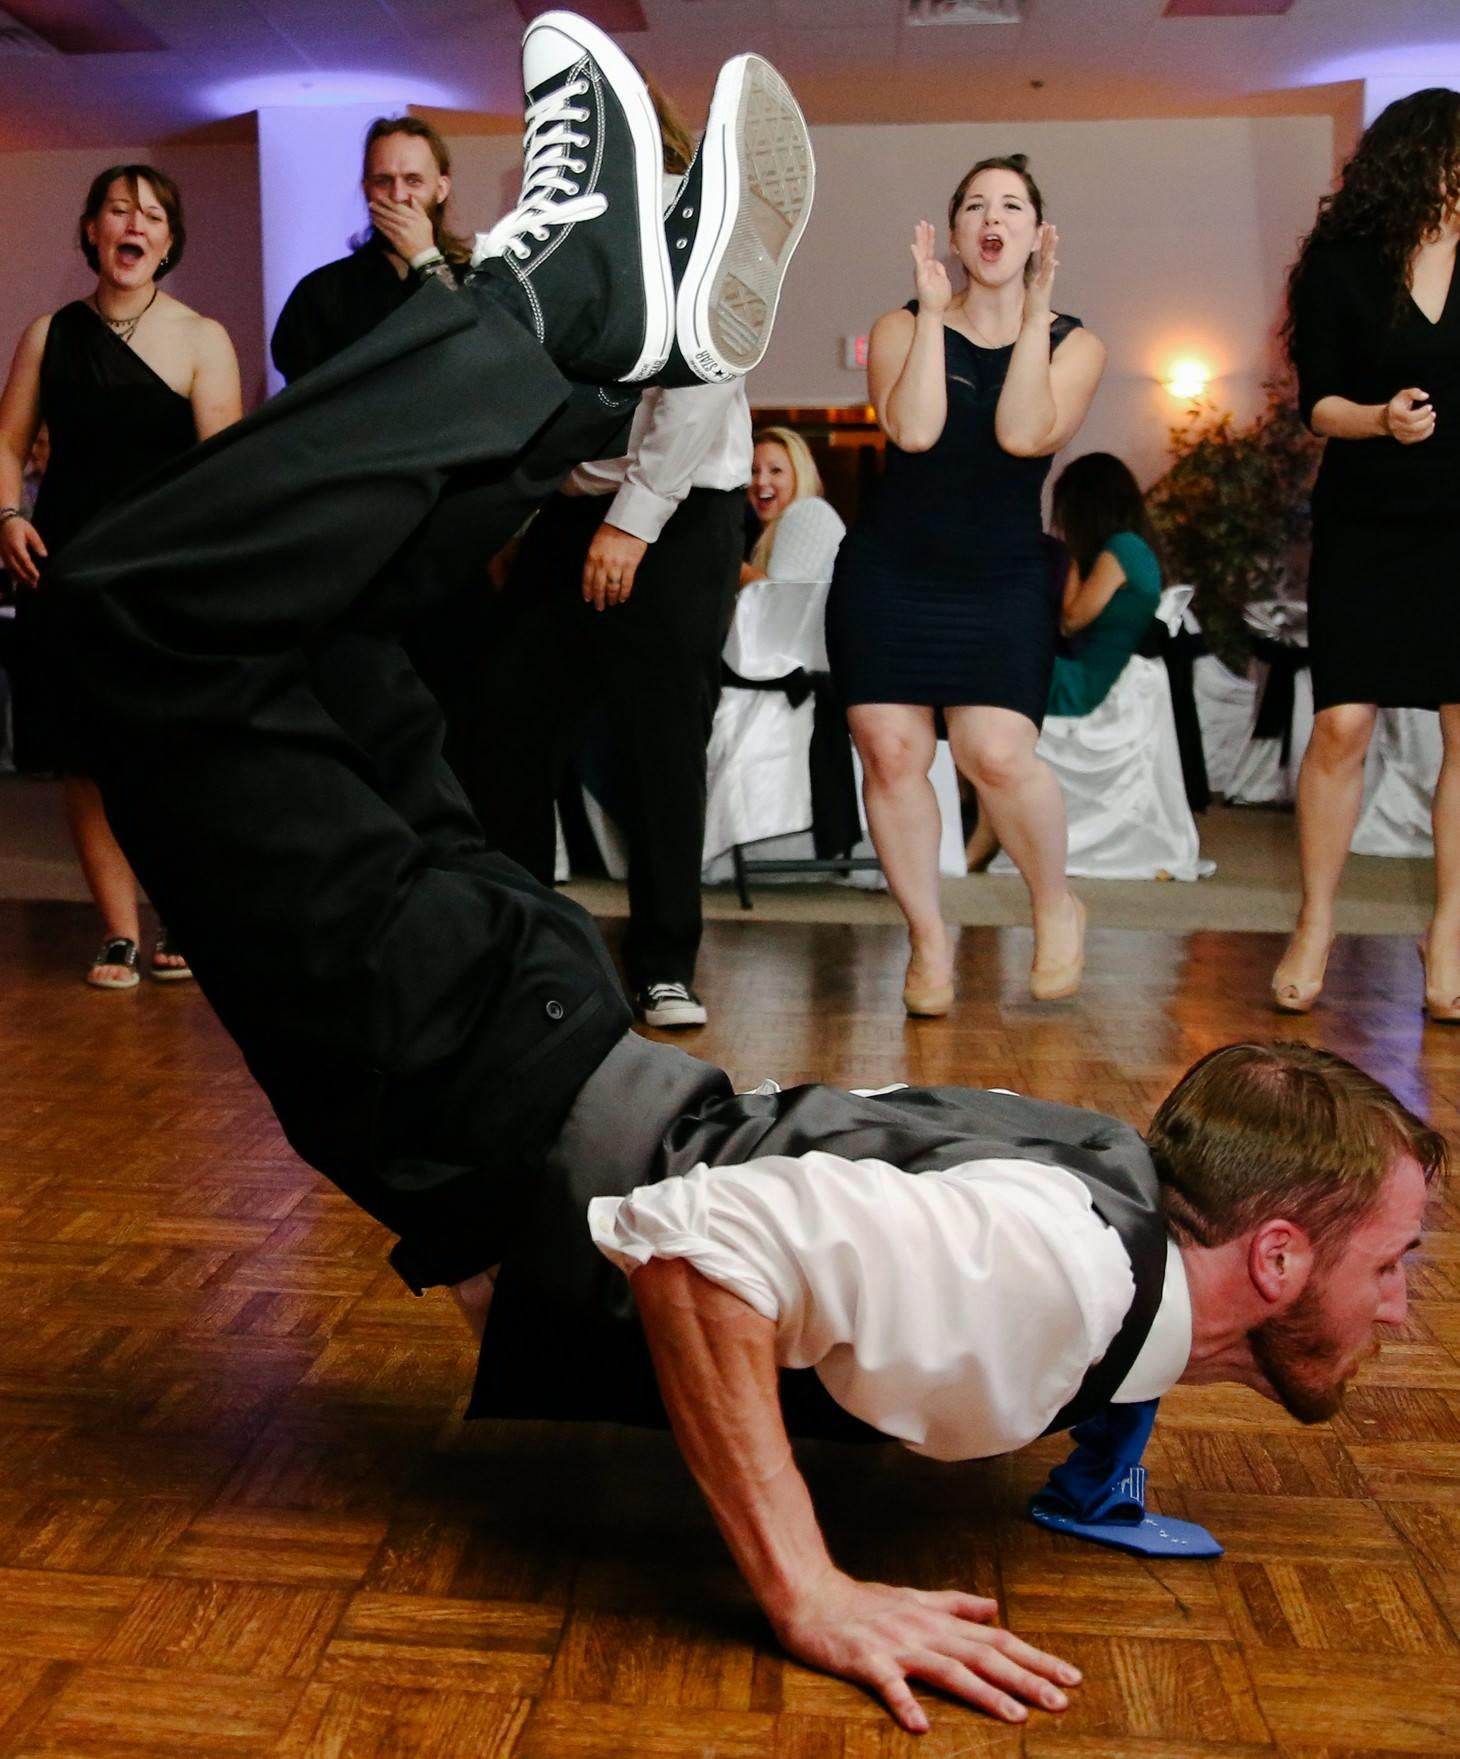 072-nyc-wedding-photographer-nj-nerdy-dr-who-firehouse-wedding-smitten-chickens.jpg